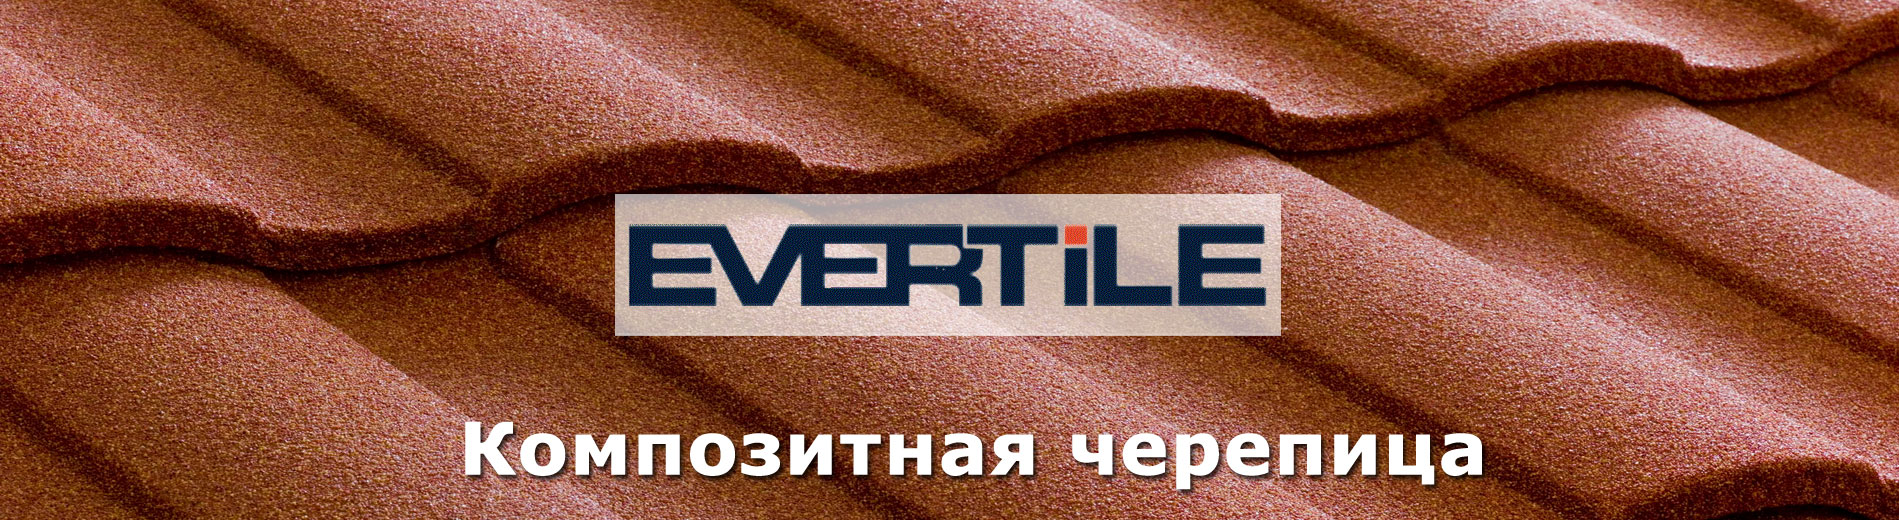 evertile_banner